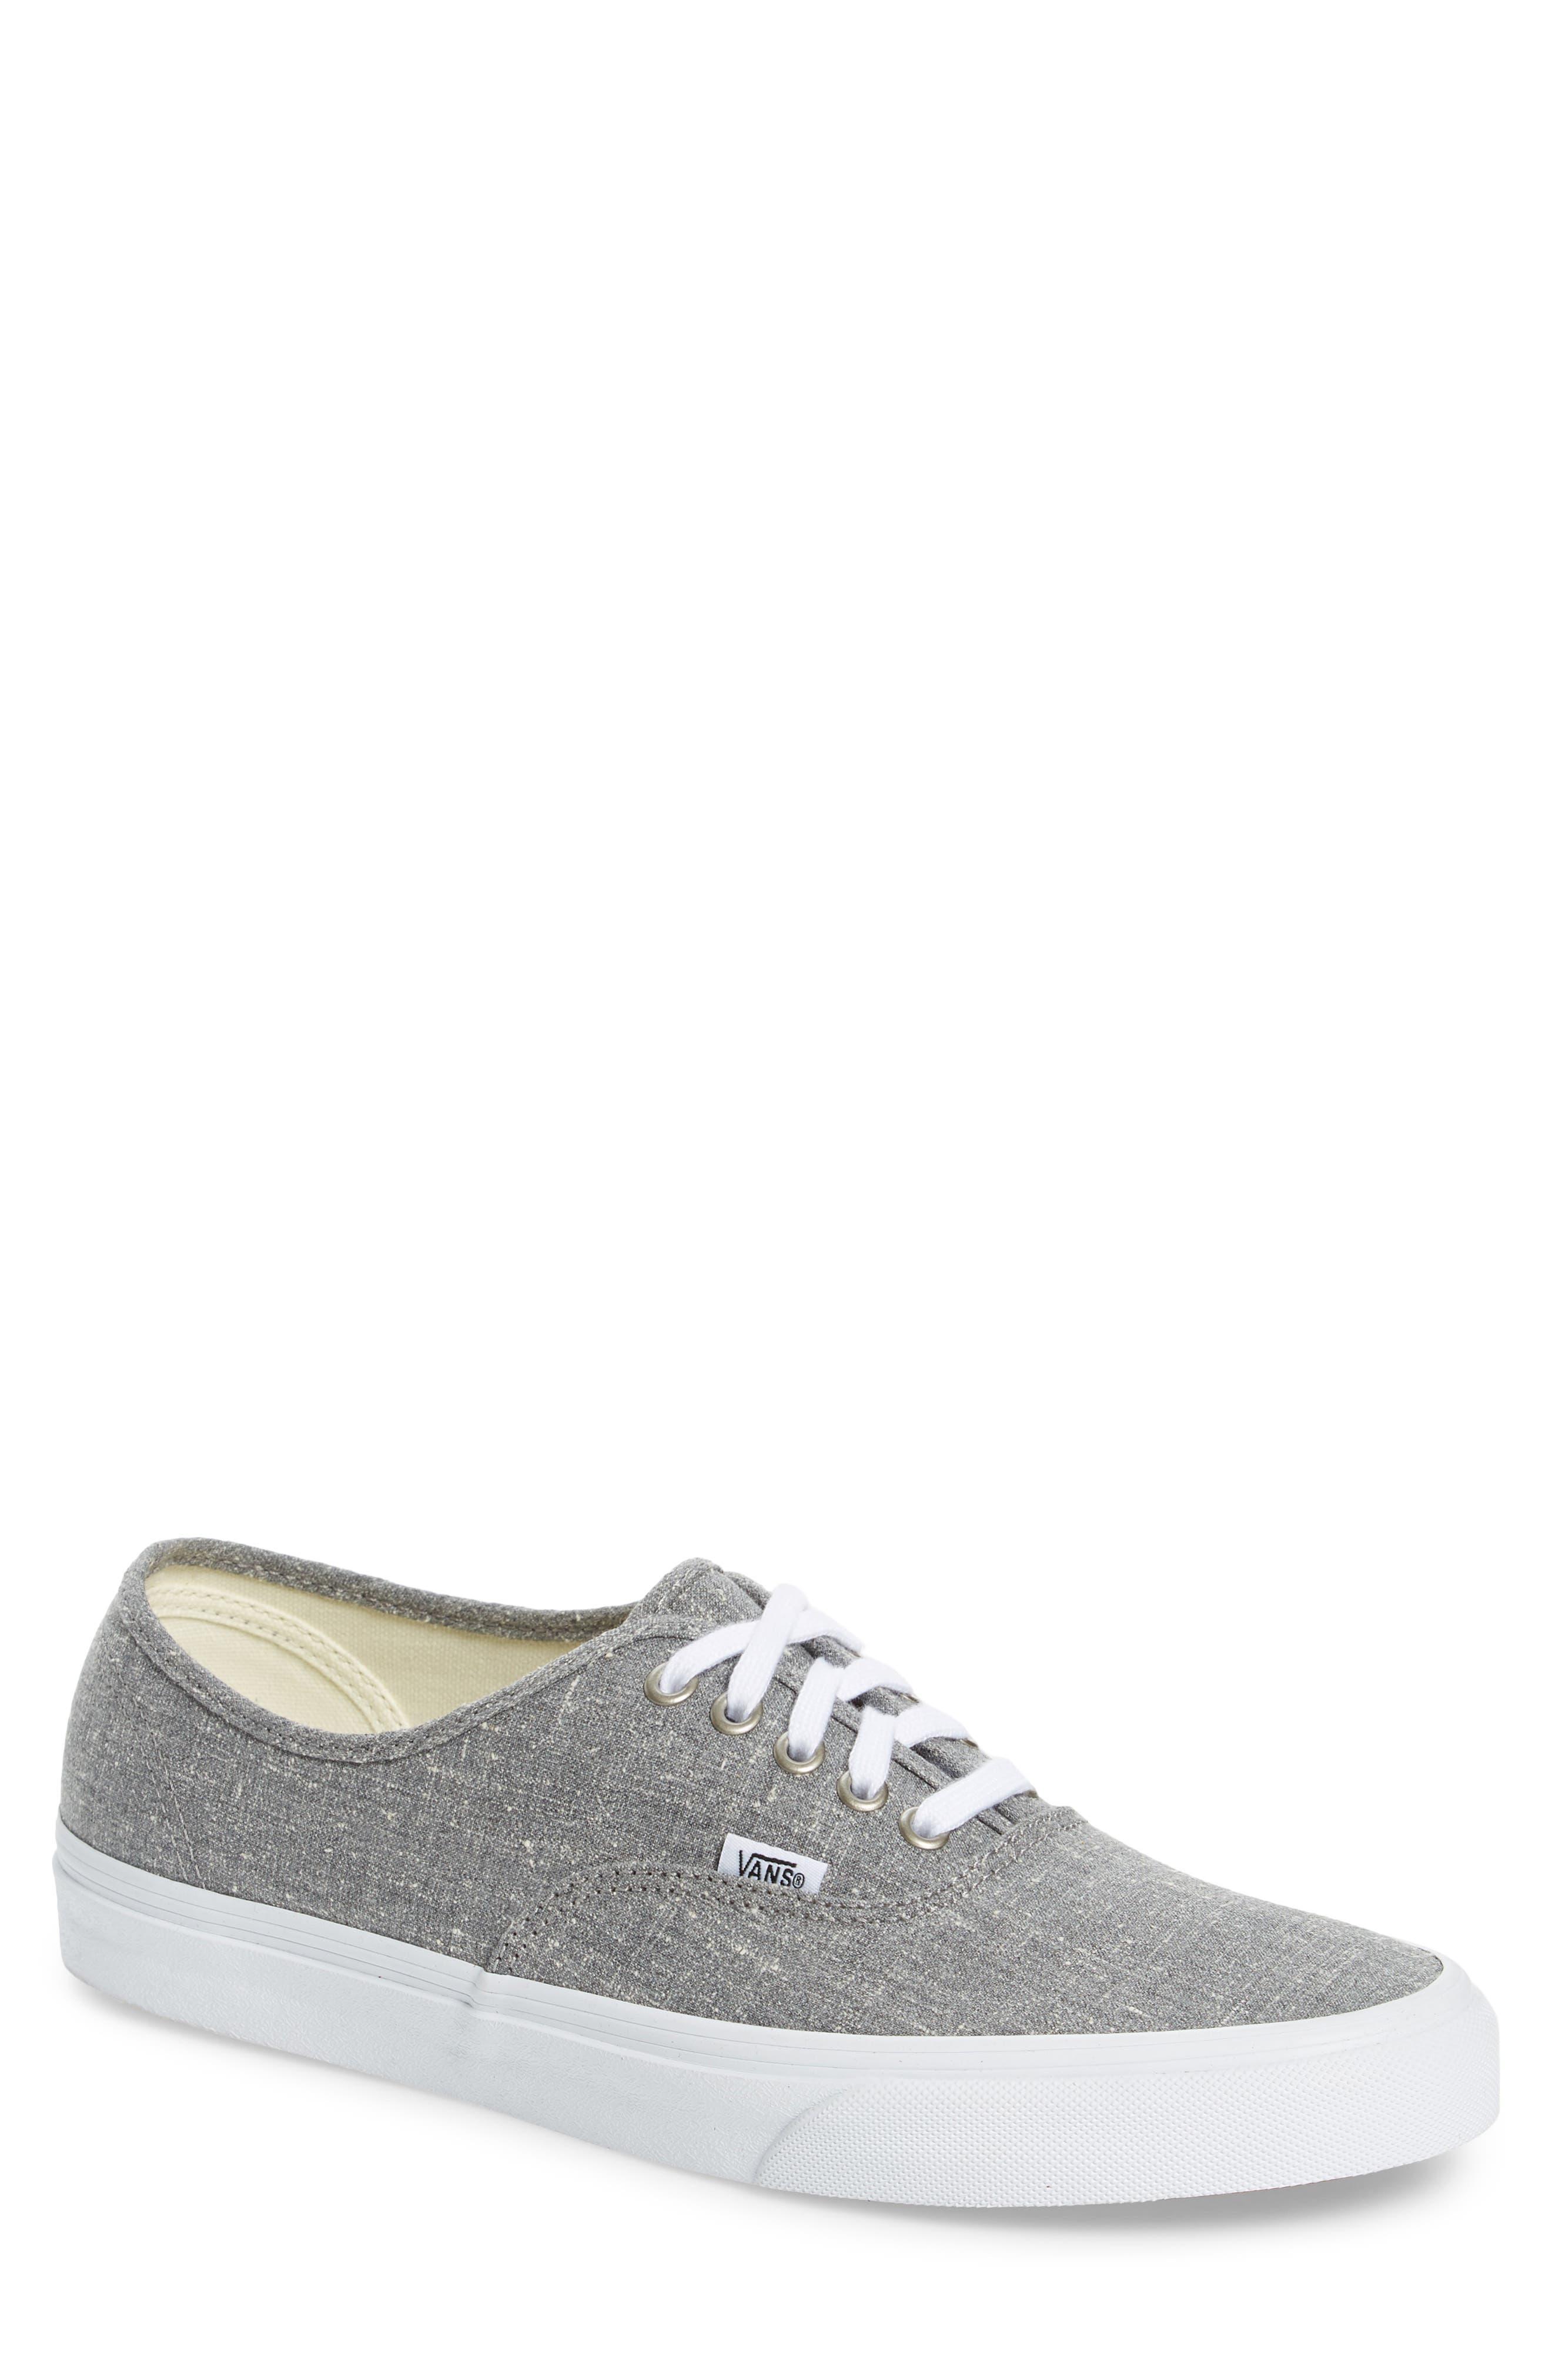 Authentic Sneaker,                             Main thumbnail 1, color,                             030